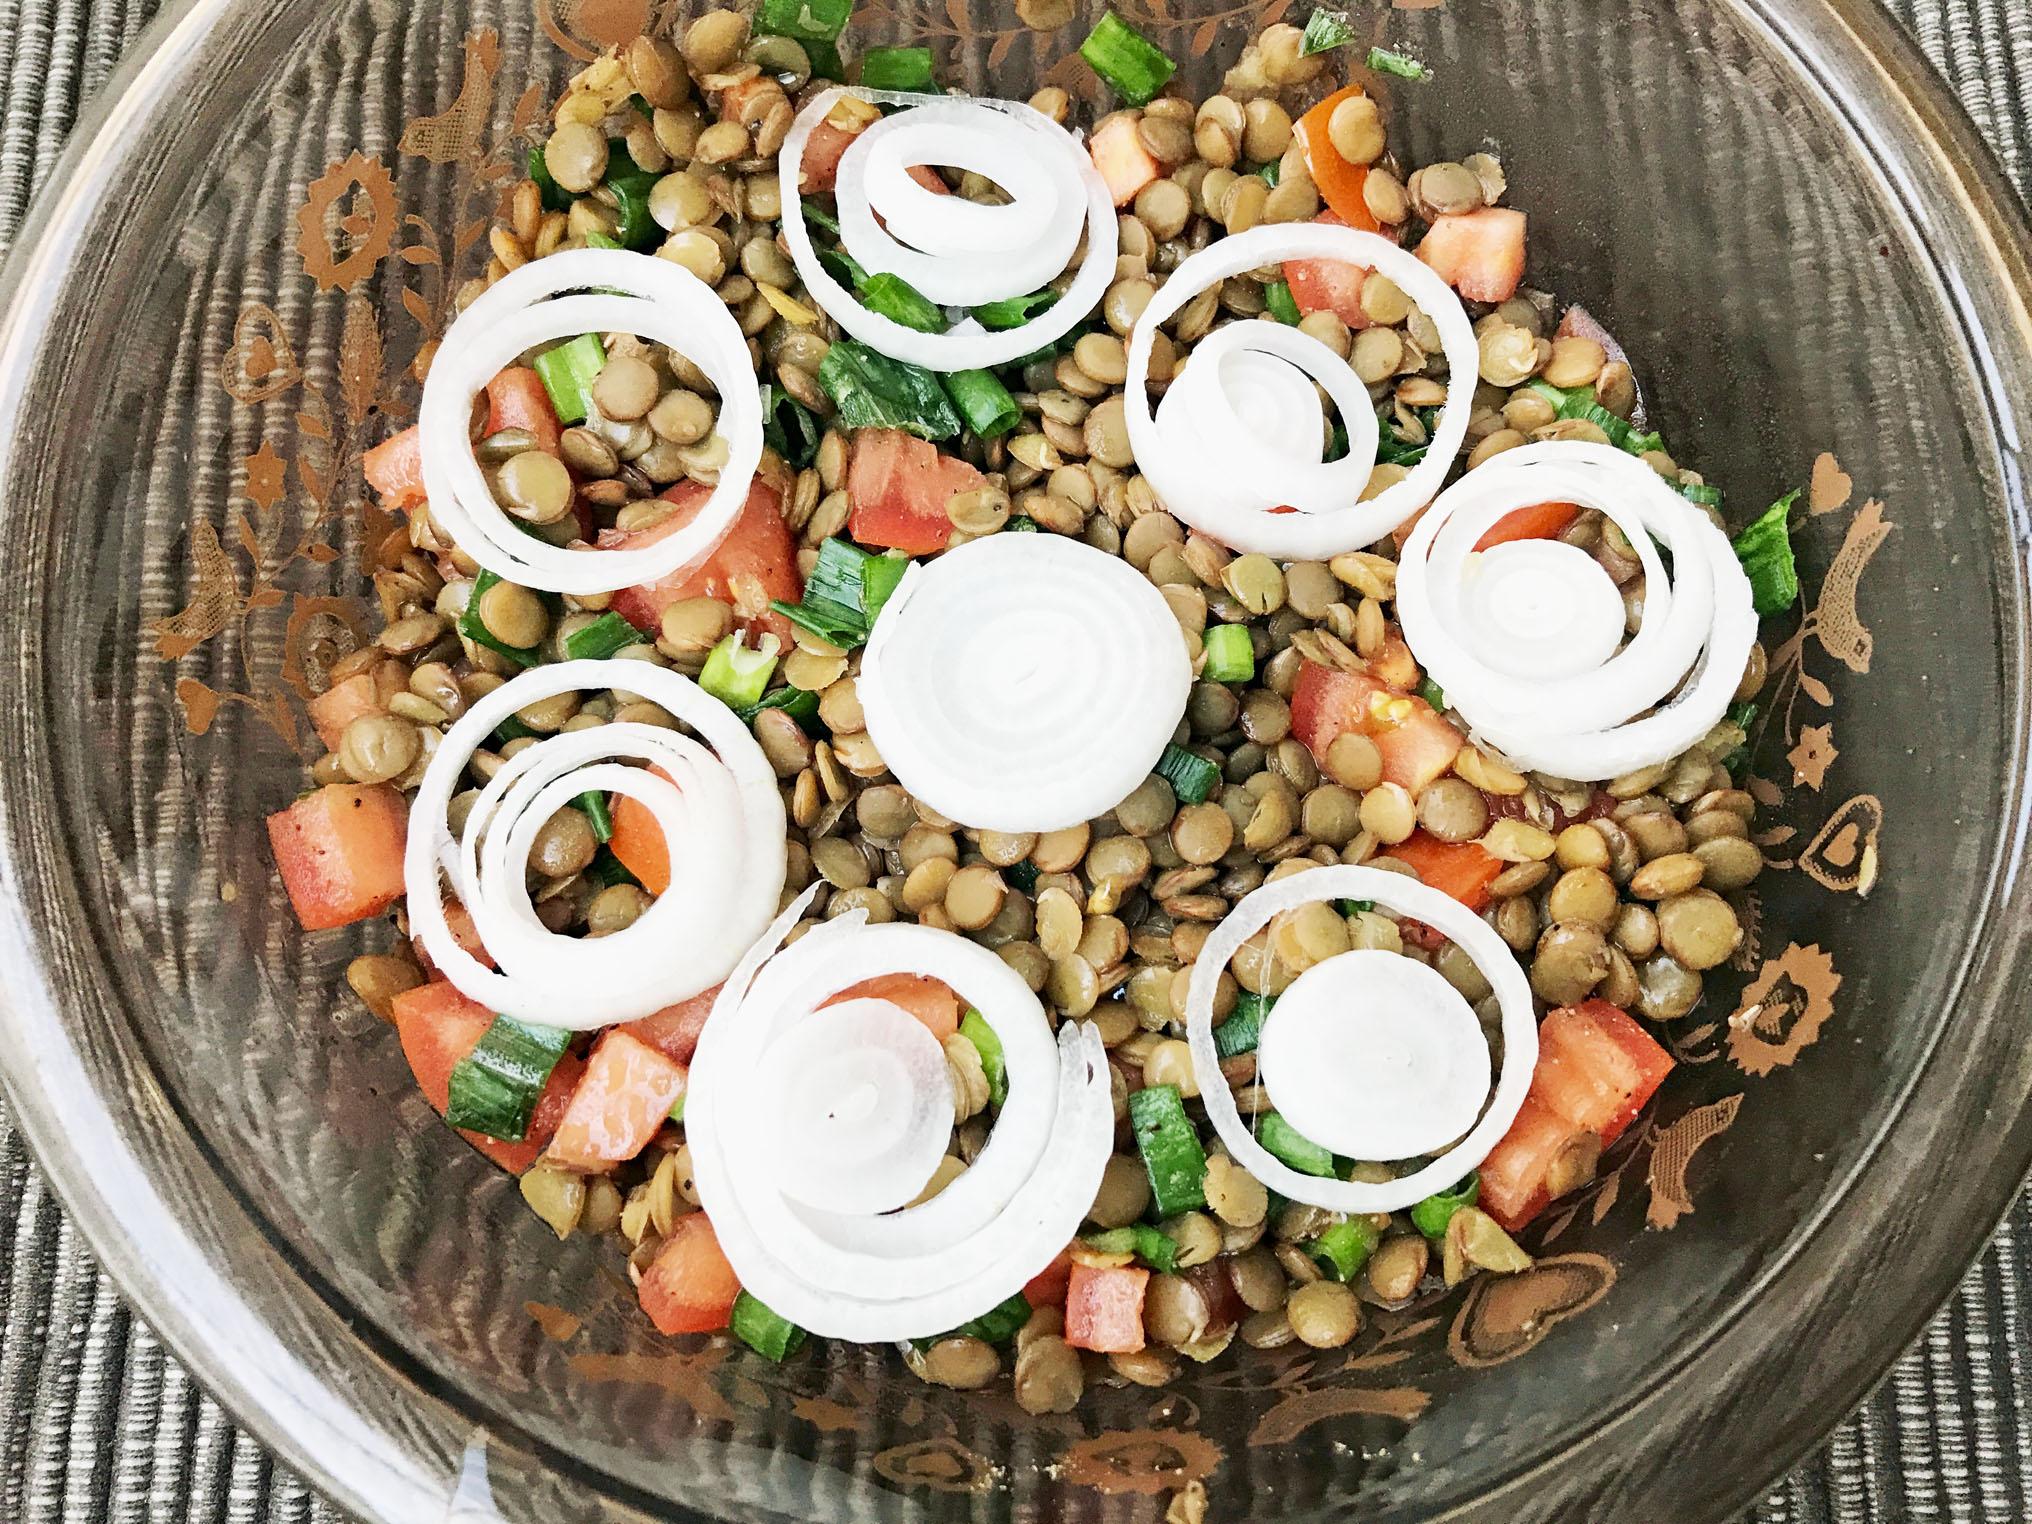 Magnificent Lentil Salad